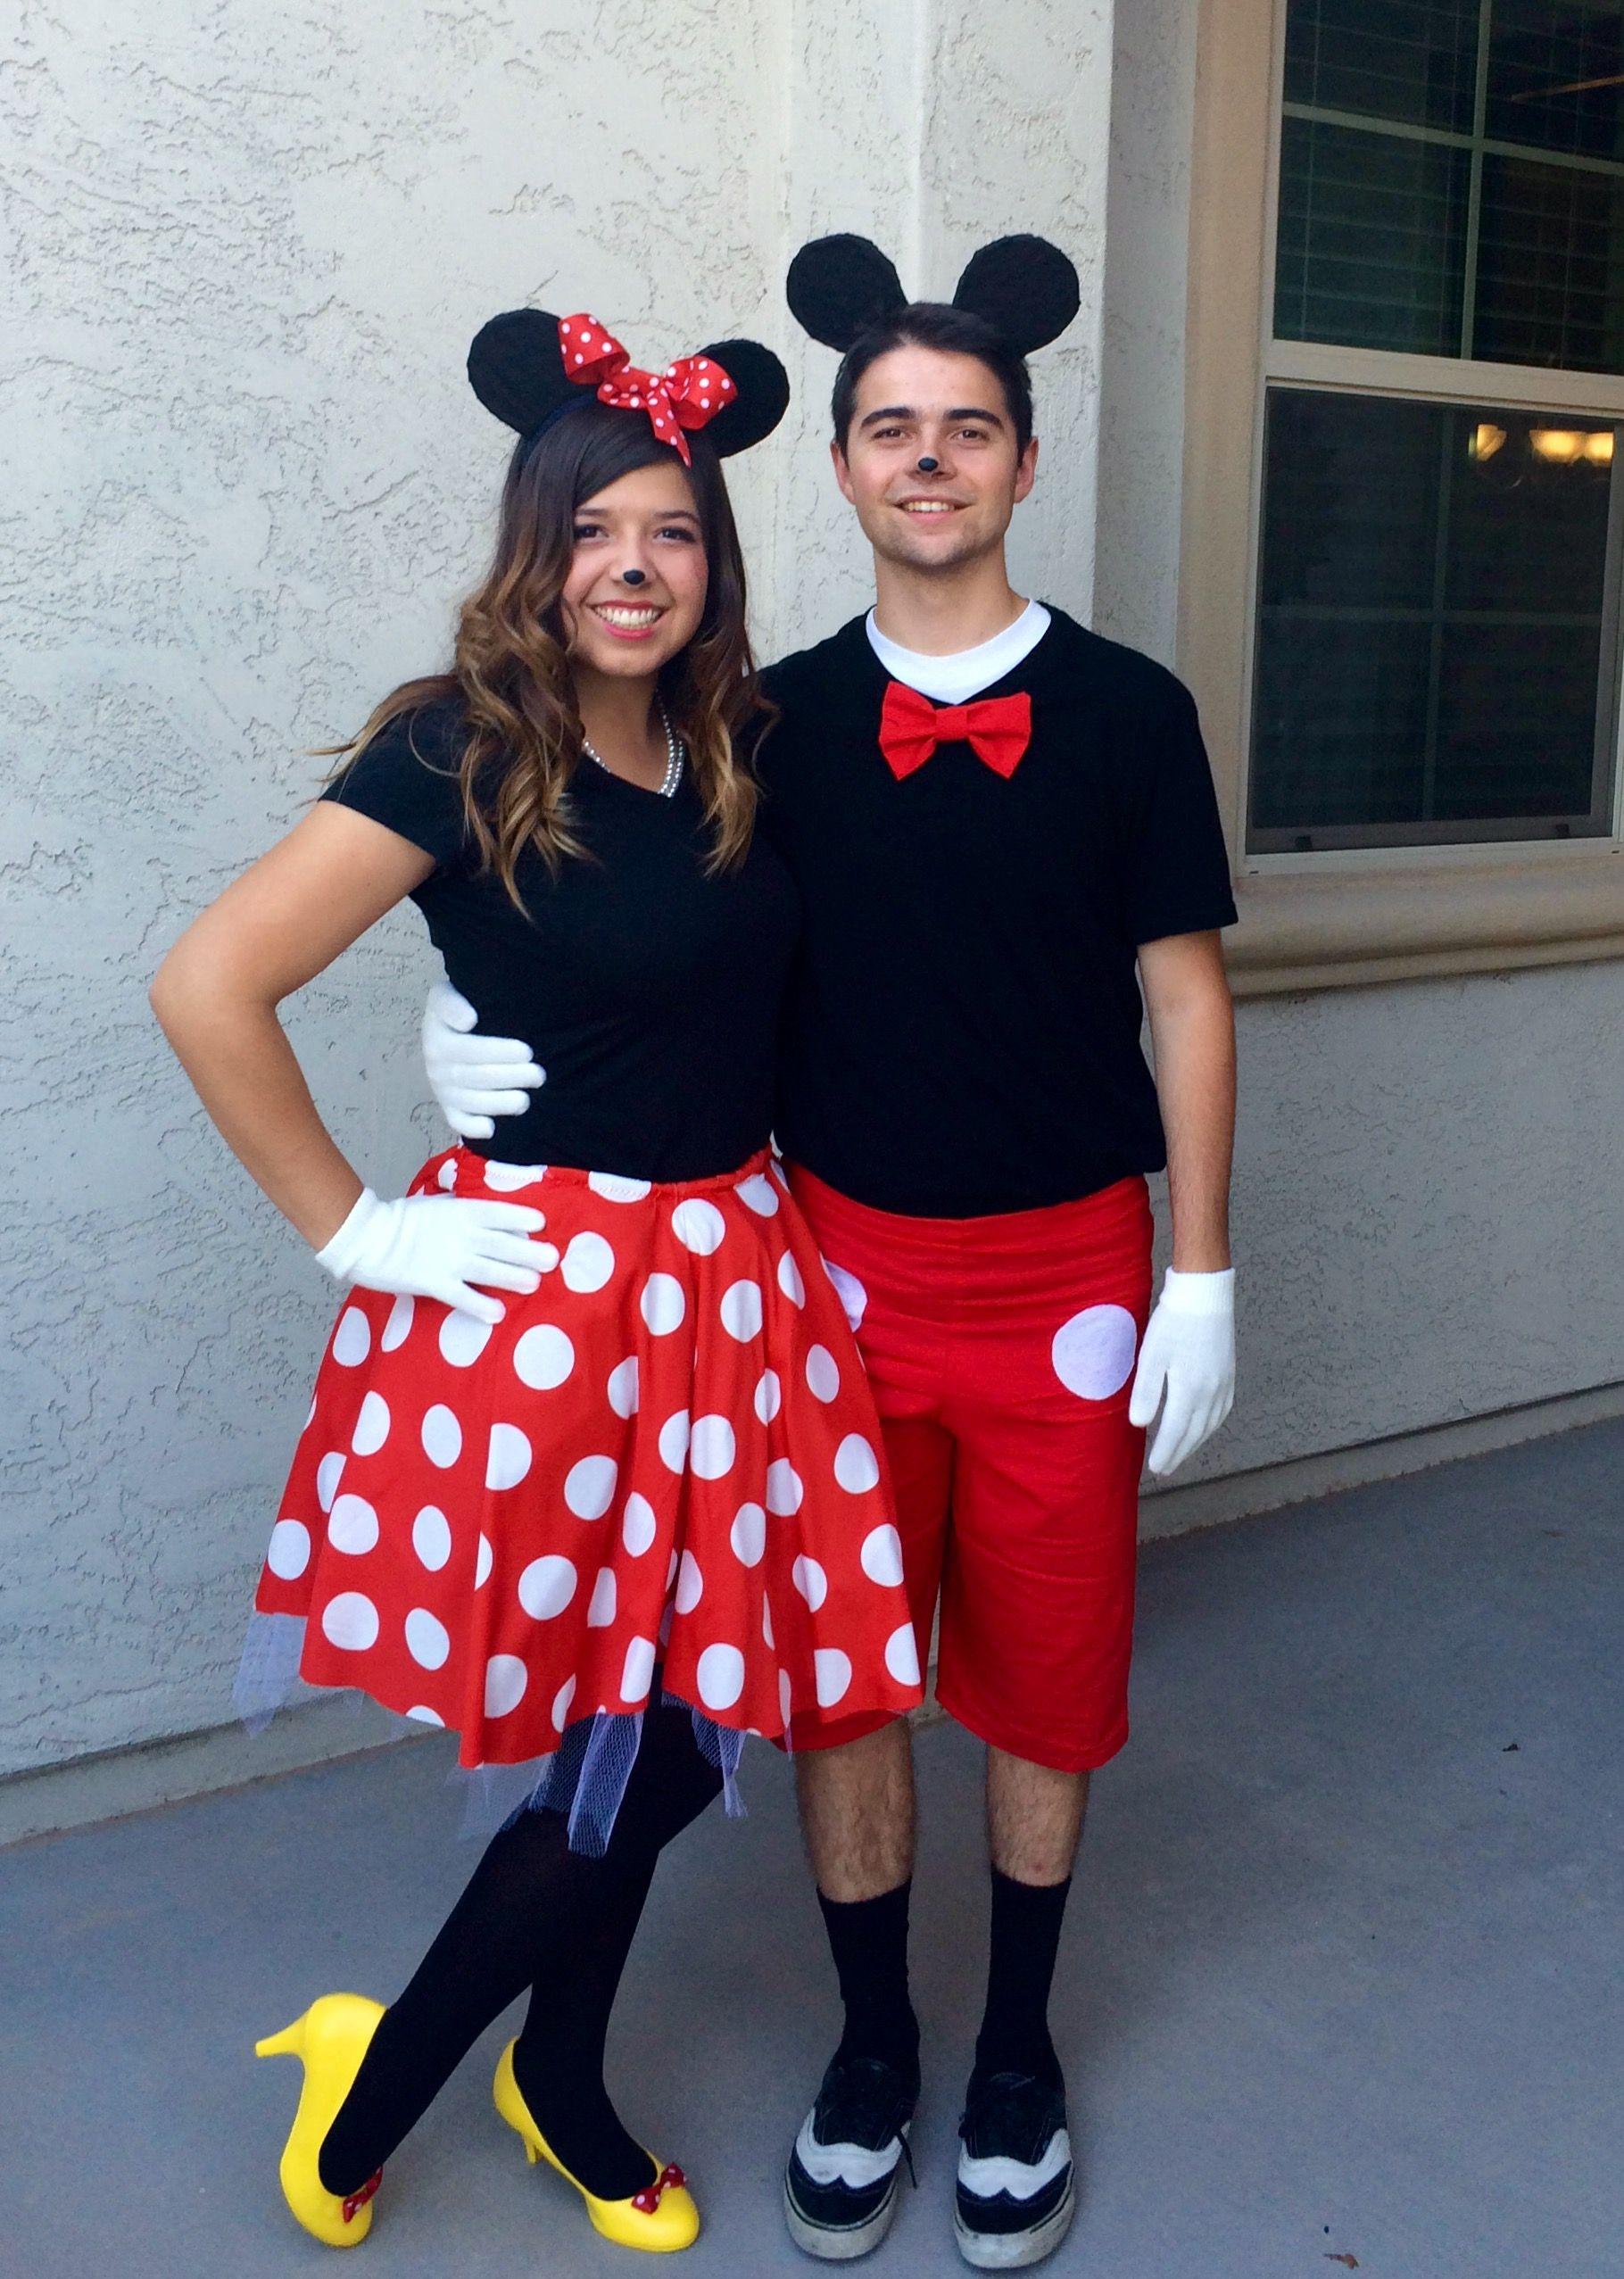 Mickey and Minnie Costume | Minnie costume, Minnie mouse halloween costume,  Mickey and minnie costumes